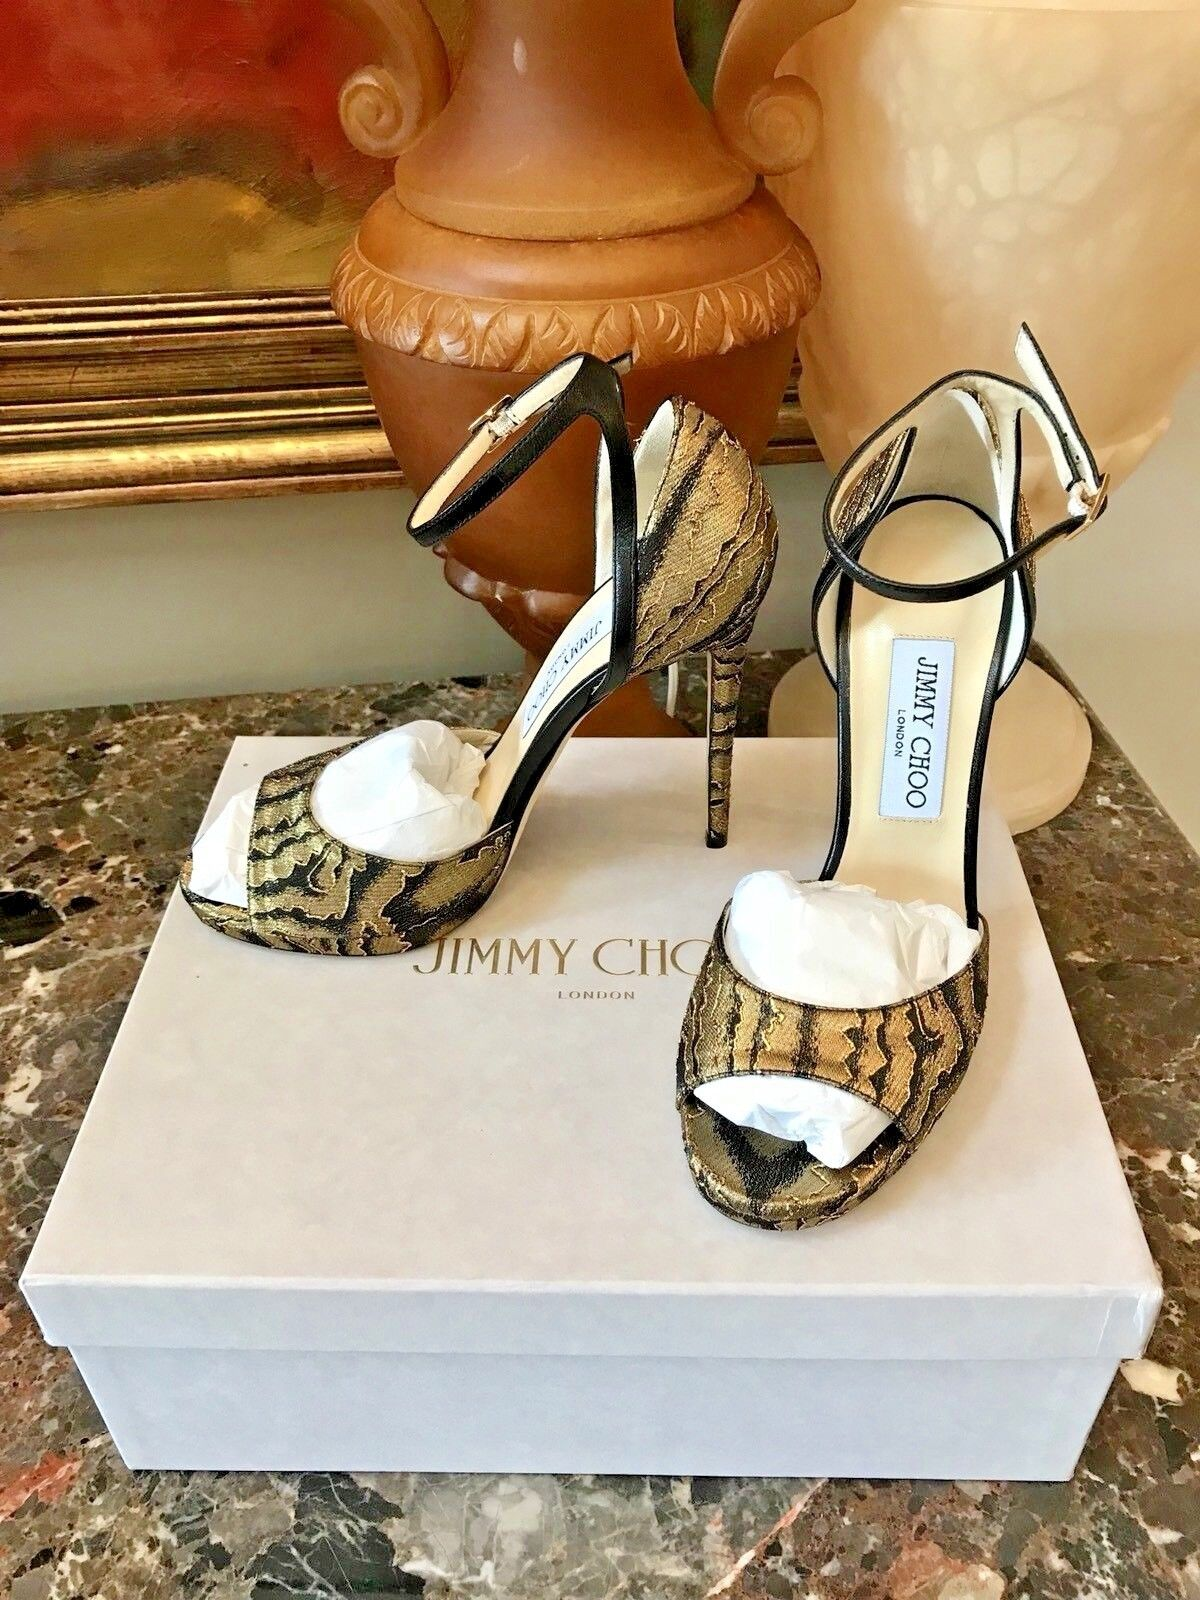 nuovo di marca NIB NIB NIB Jimmy Choo Metallic Pearl Moire Ankle Sandal  795 - 38.5  risparmia il 35% - 70% di sconto